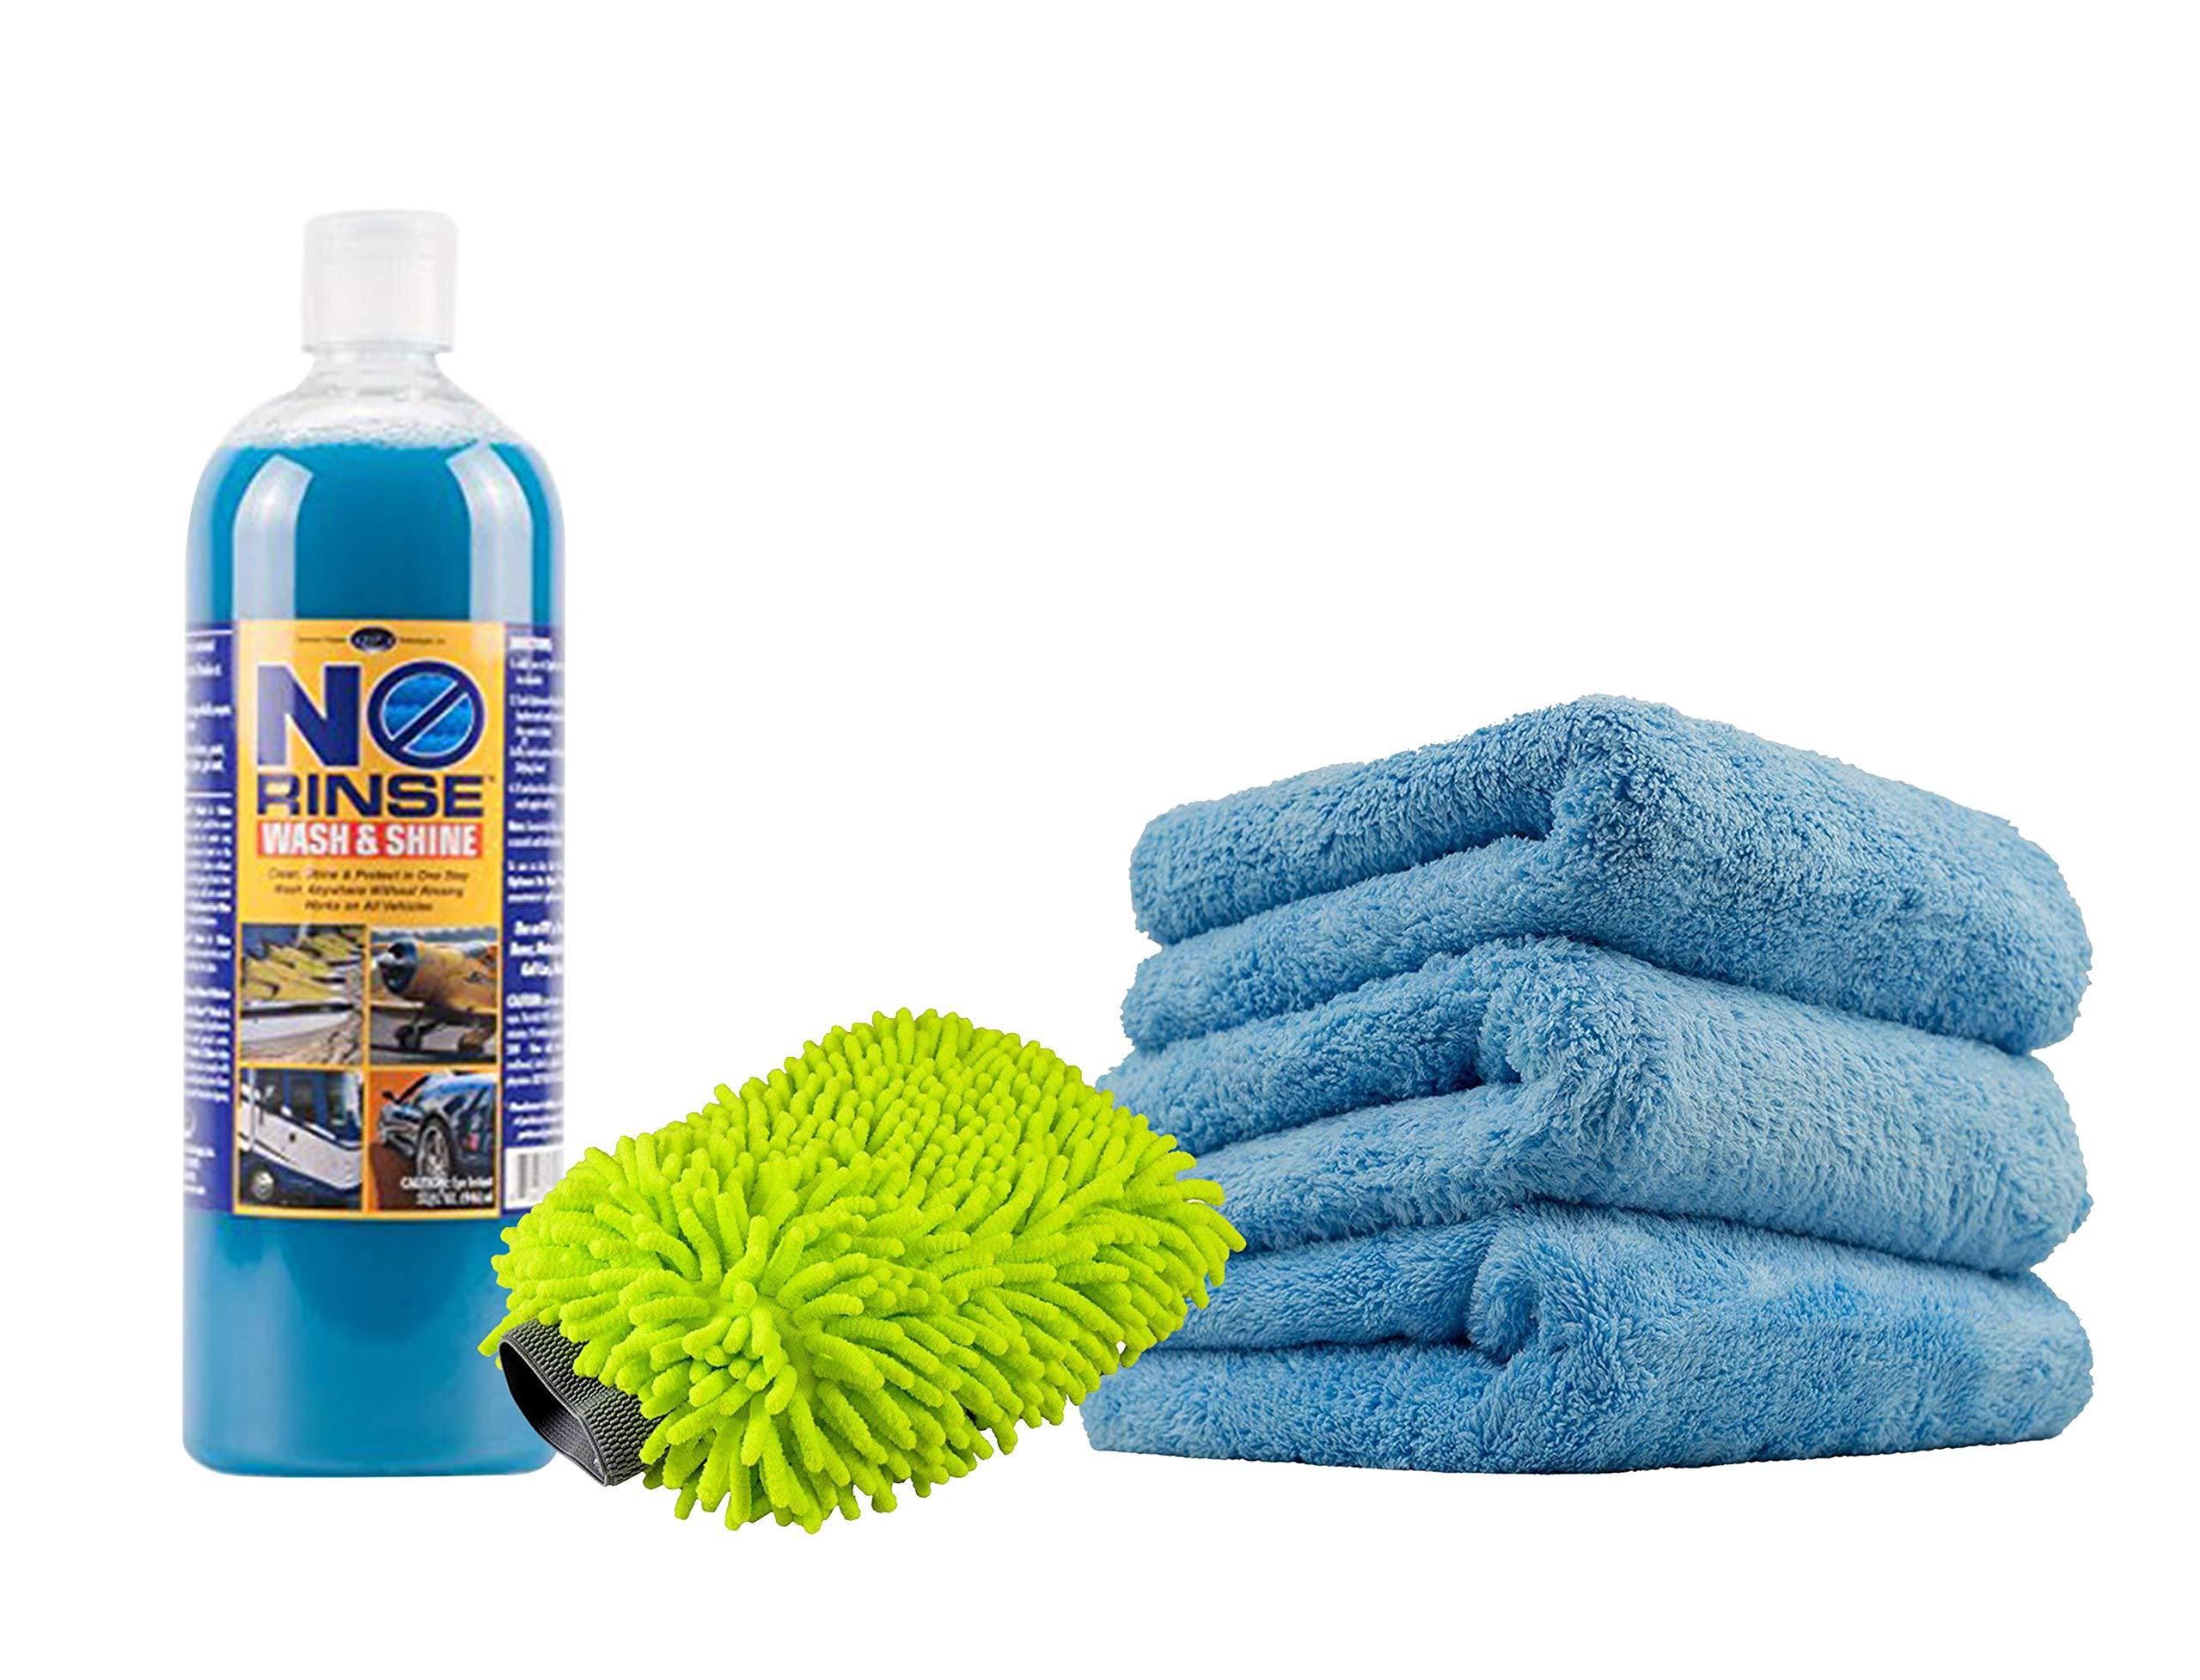 Optimum No Rinse Wash & Shine - 32 oz. Kit